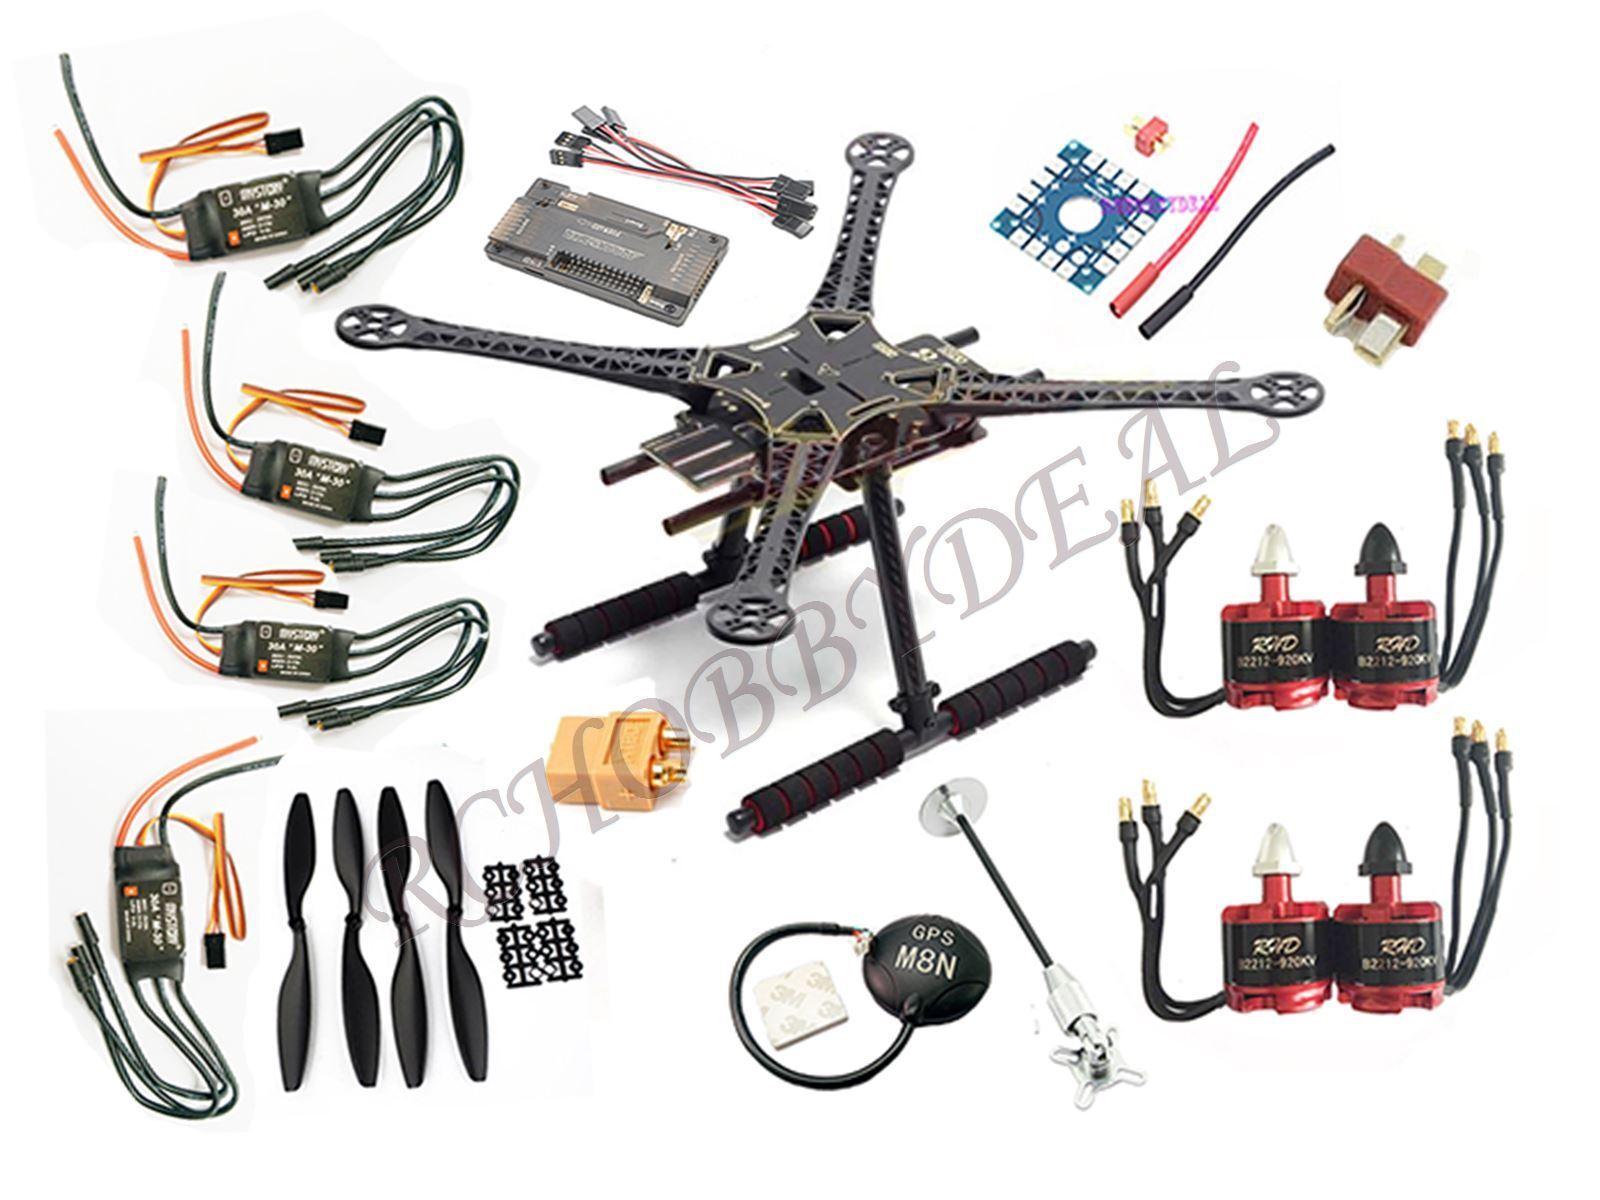 DIY s500  Quadcopter apm2.8 neo-m8n GPS b2212 920kv MOTORE cw&ccw SimonK 30a ESC  risposte rapide